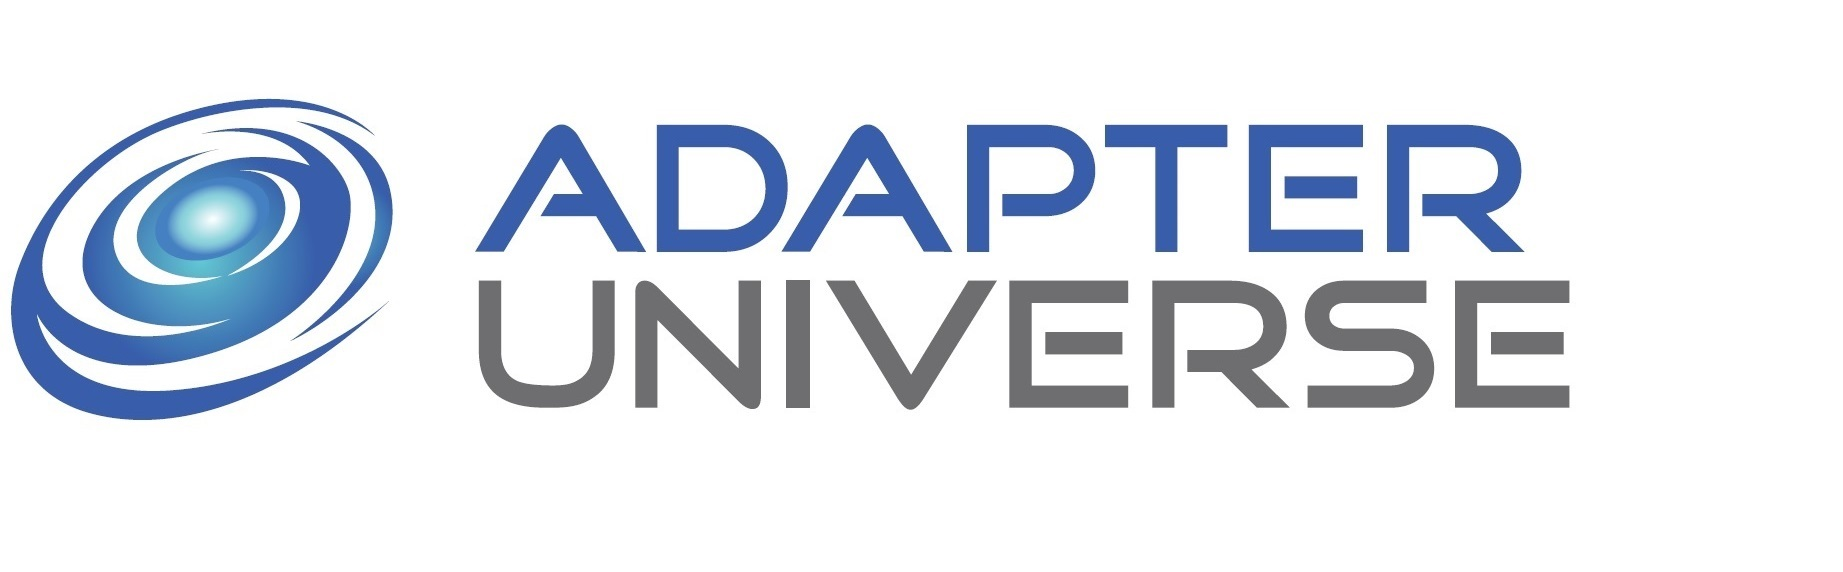 Adapter Universe